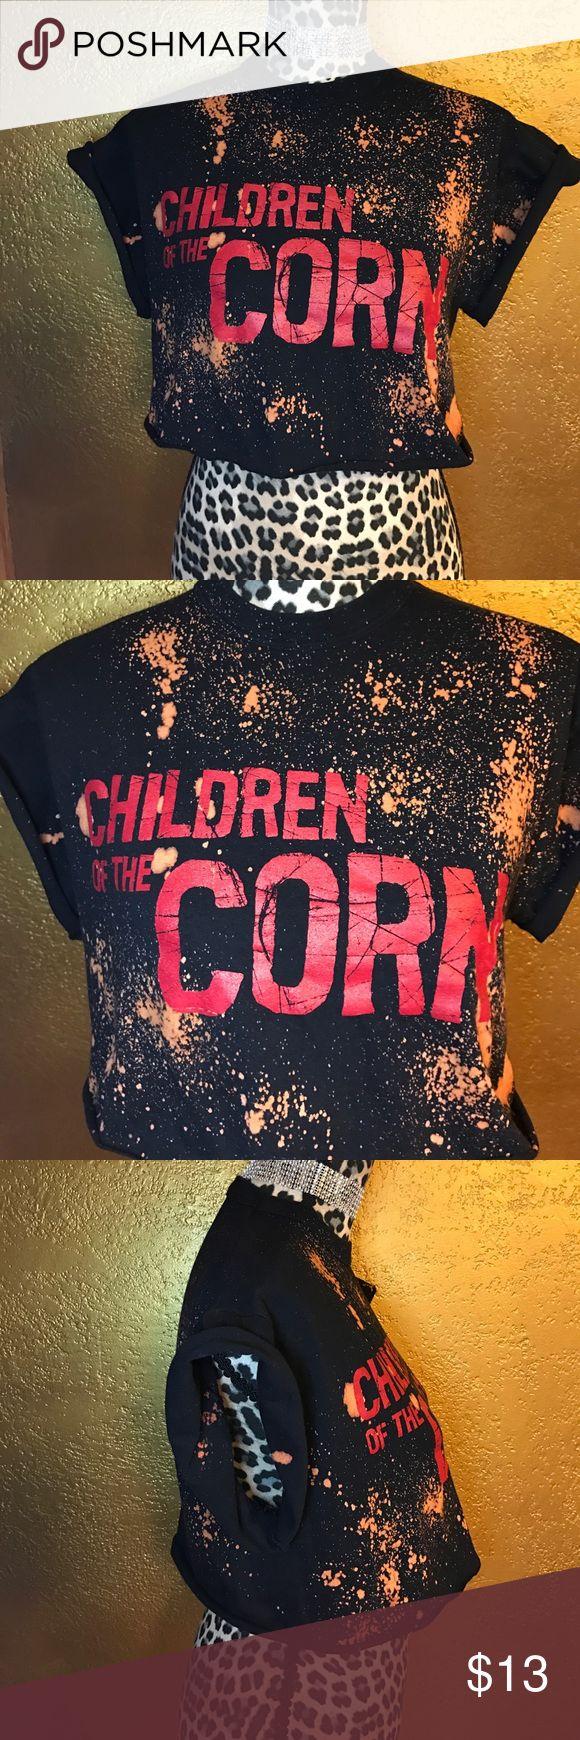 Children of the corn crop In wonderful condition custom made black acid washed children of the corn crop top❌PRICE IS FIRM❌ Tops Crop Tops